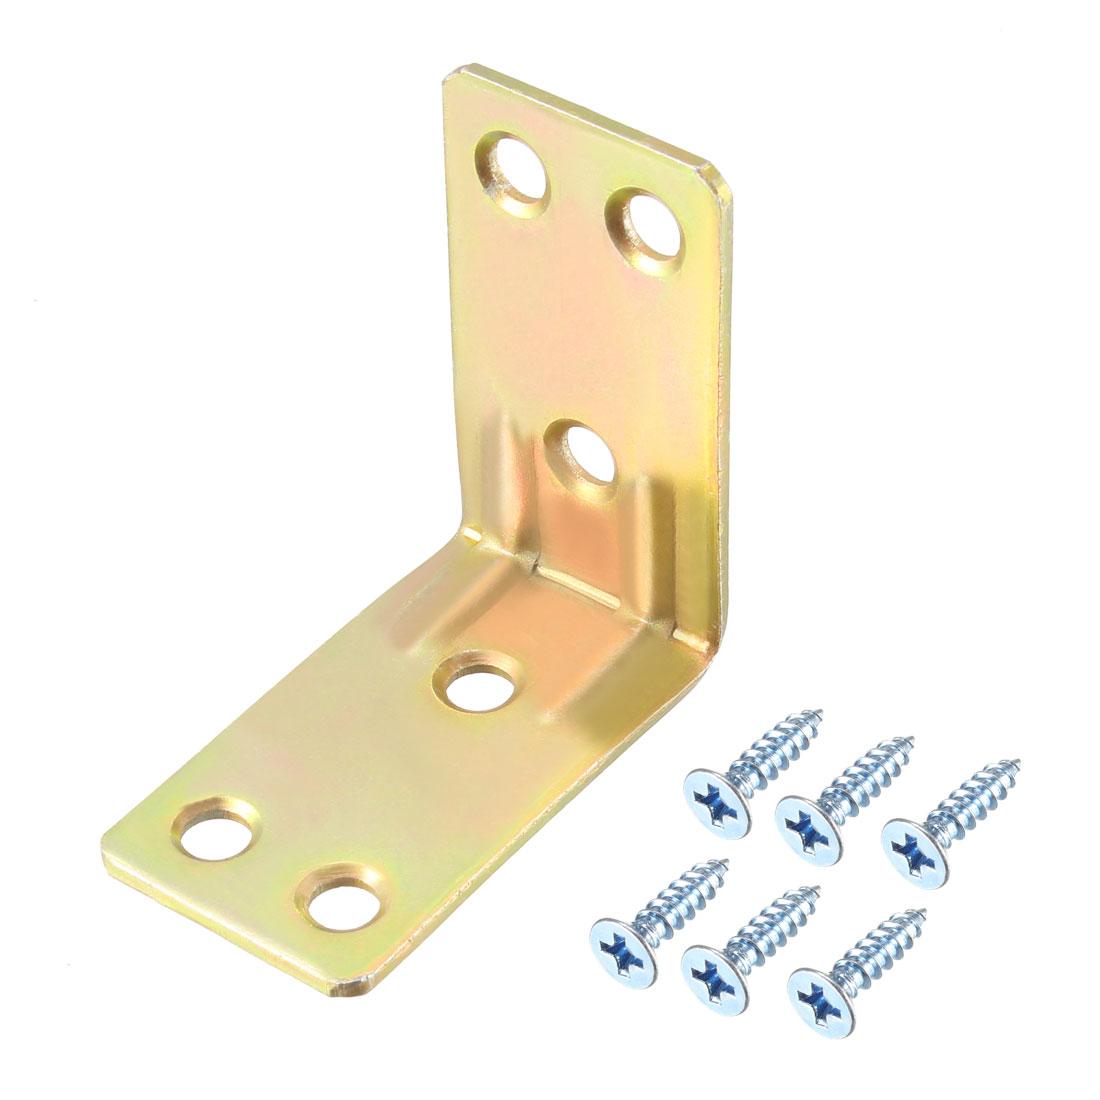 Corner Brace, 42mm x 42mm Zinc Plated Joint Right Angle Bracket w Screws, 6 Pcs